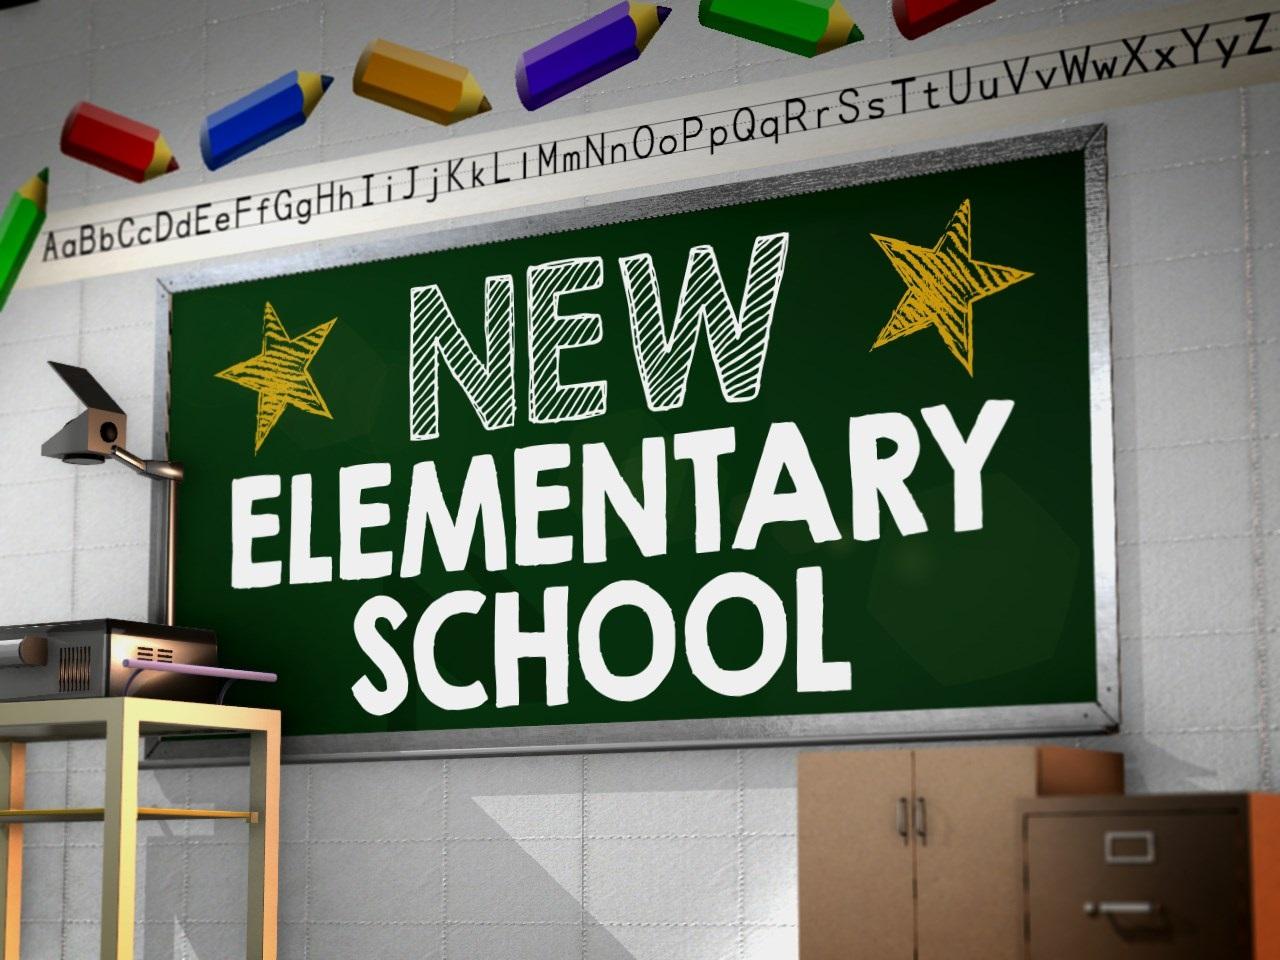 New school_1533599159090.jpg.jpg